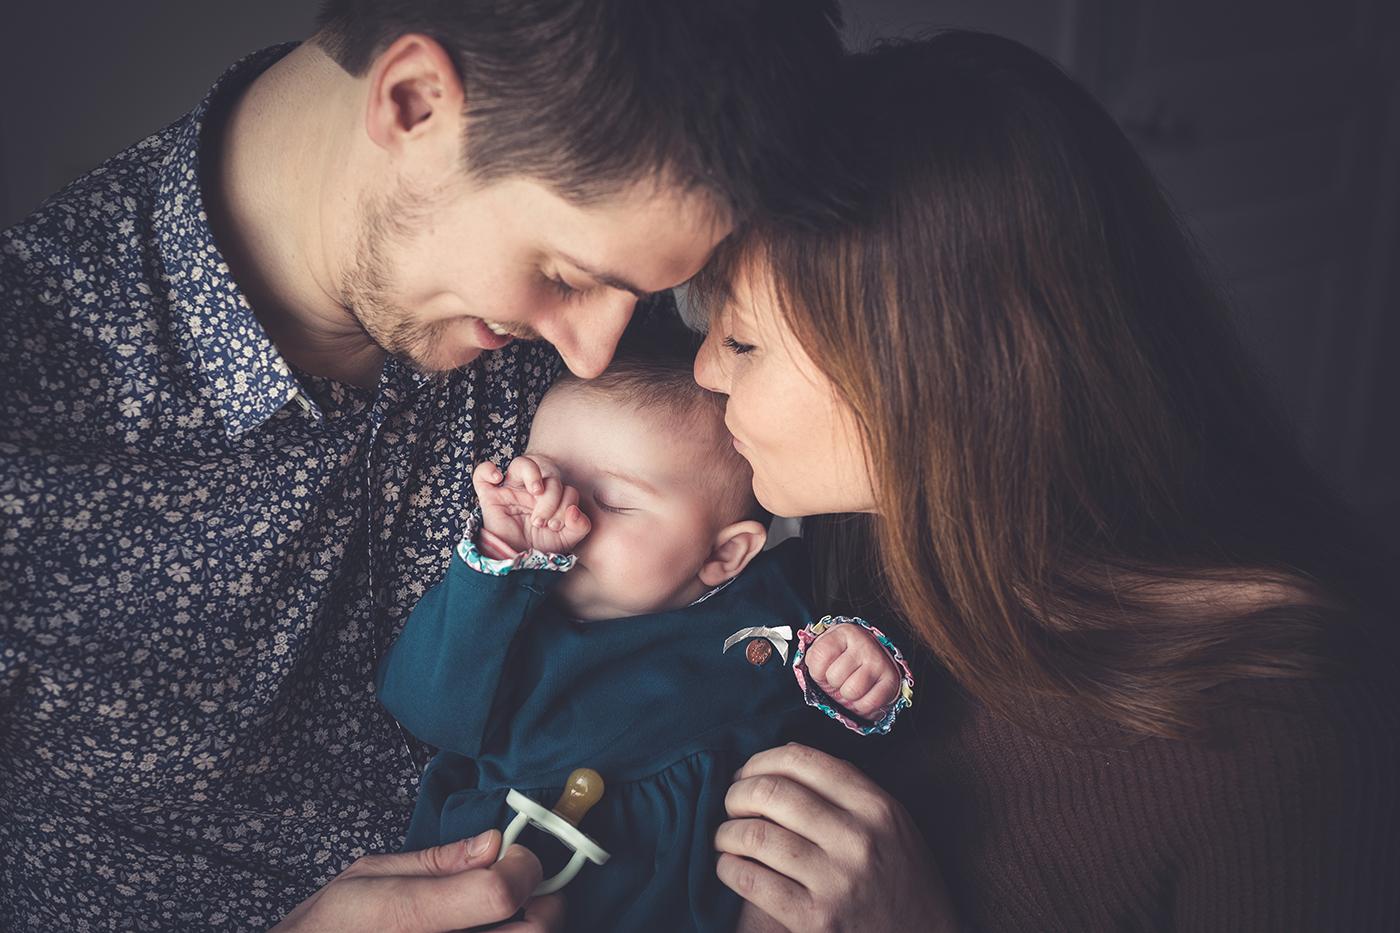 photographe-naissance-maternite-enfant-bebe-poitiers-guillaume-heraud-17